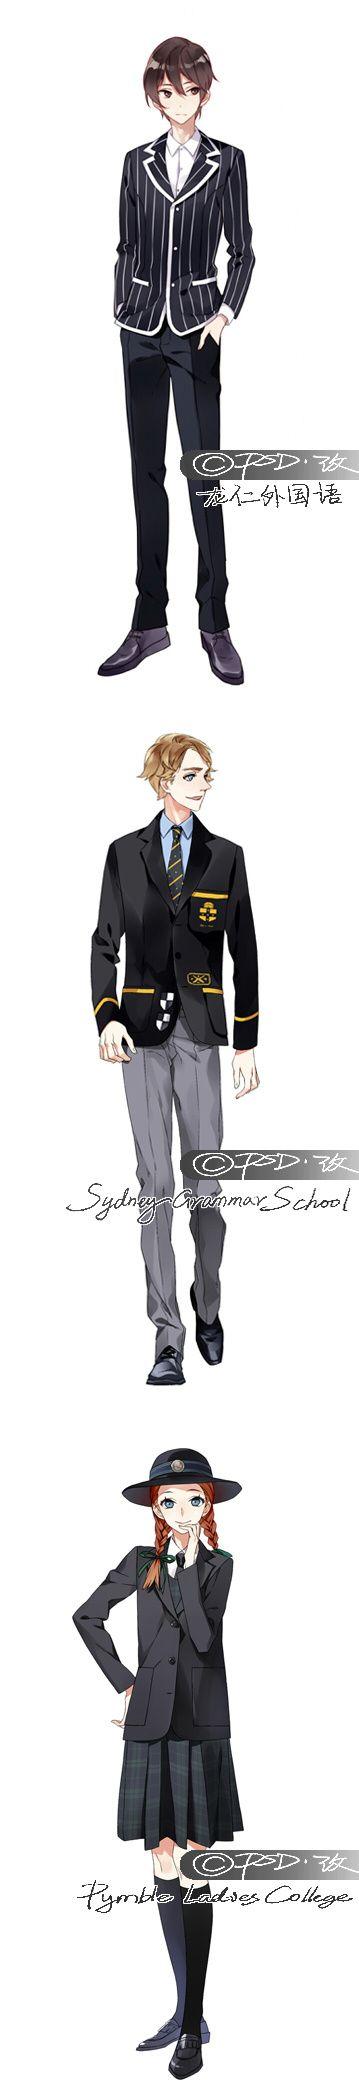 First One = School Uniform